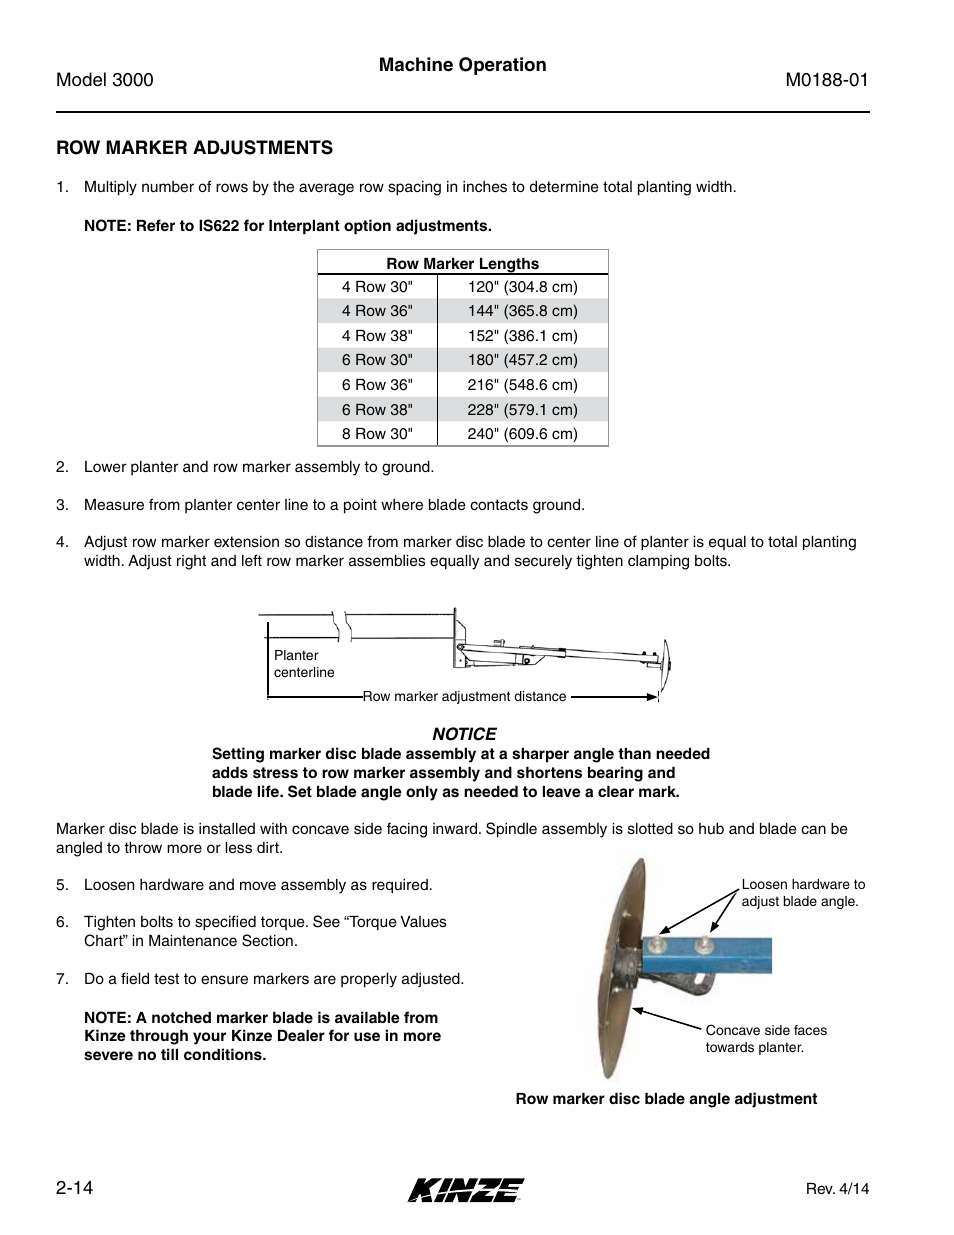 Row marker adjustments, Row marker adjustments -14 | Kinze 3000 ...